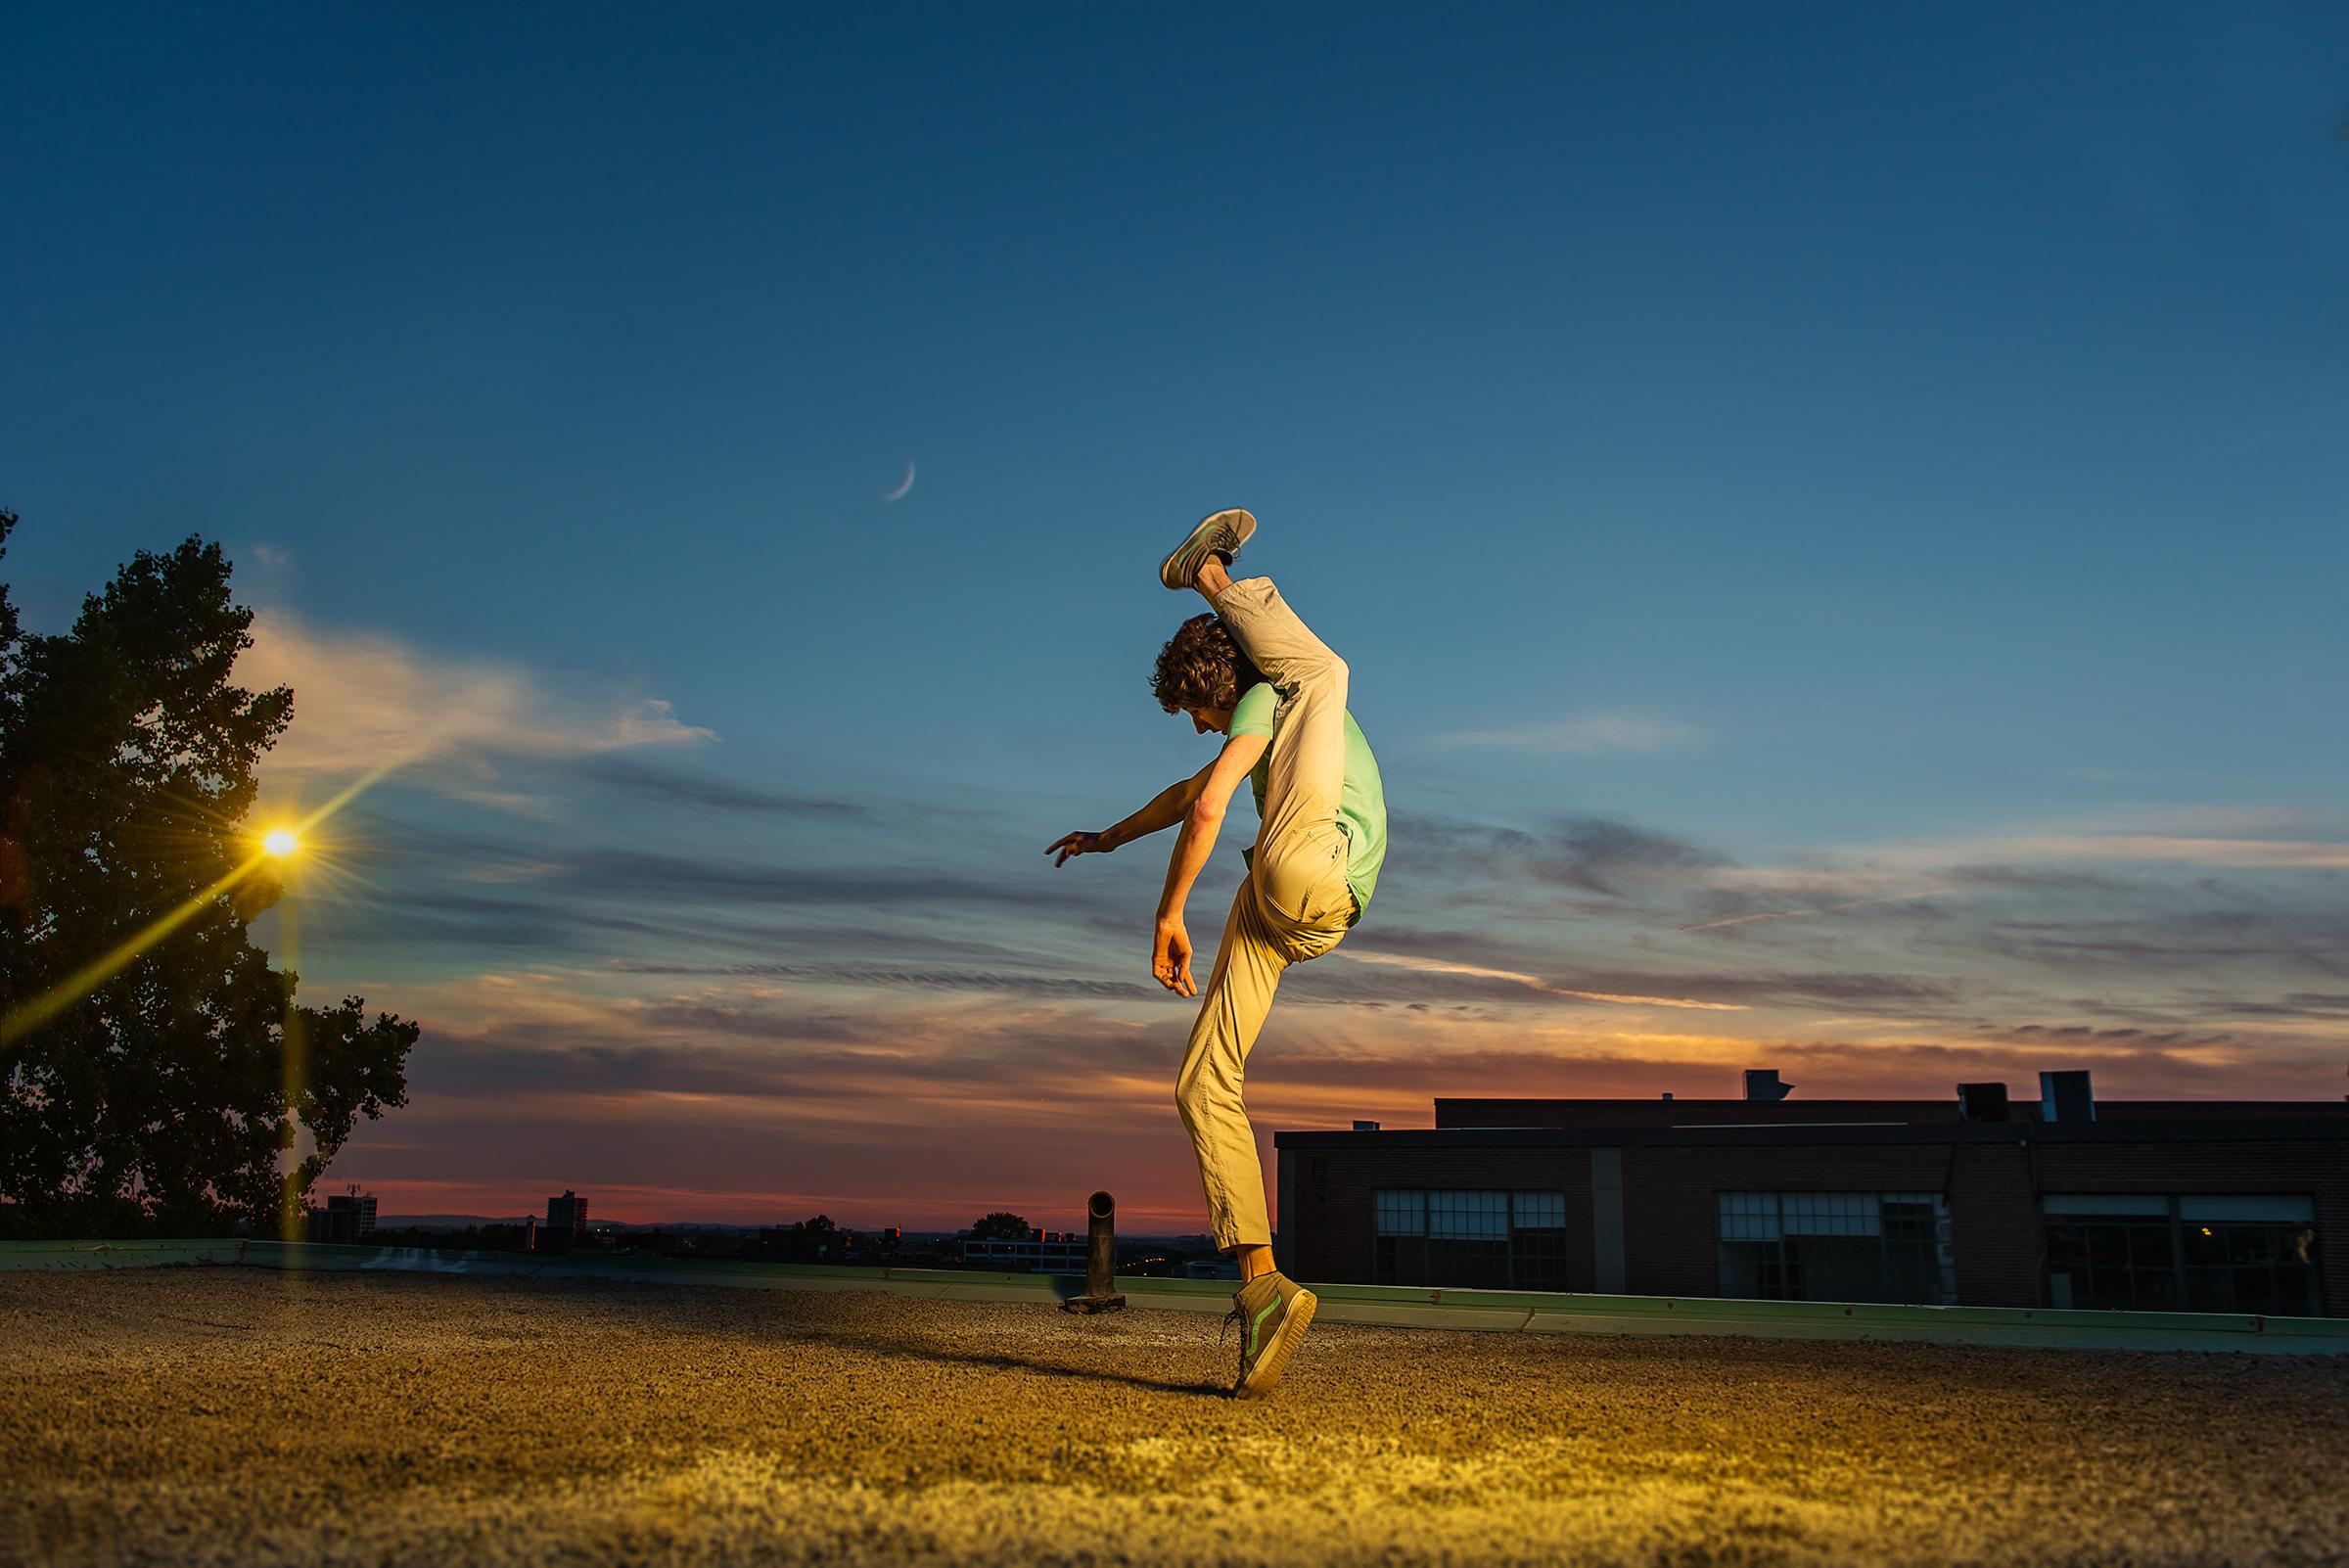 002 Break dance Arthur Cadre Damian Siqueiros BBY-10650.jpg